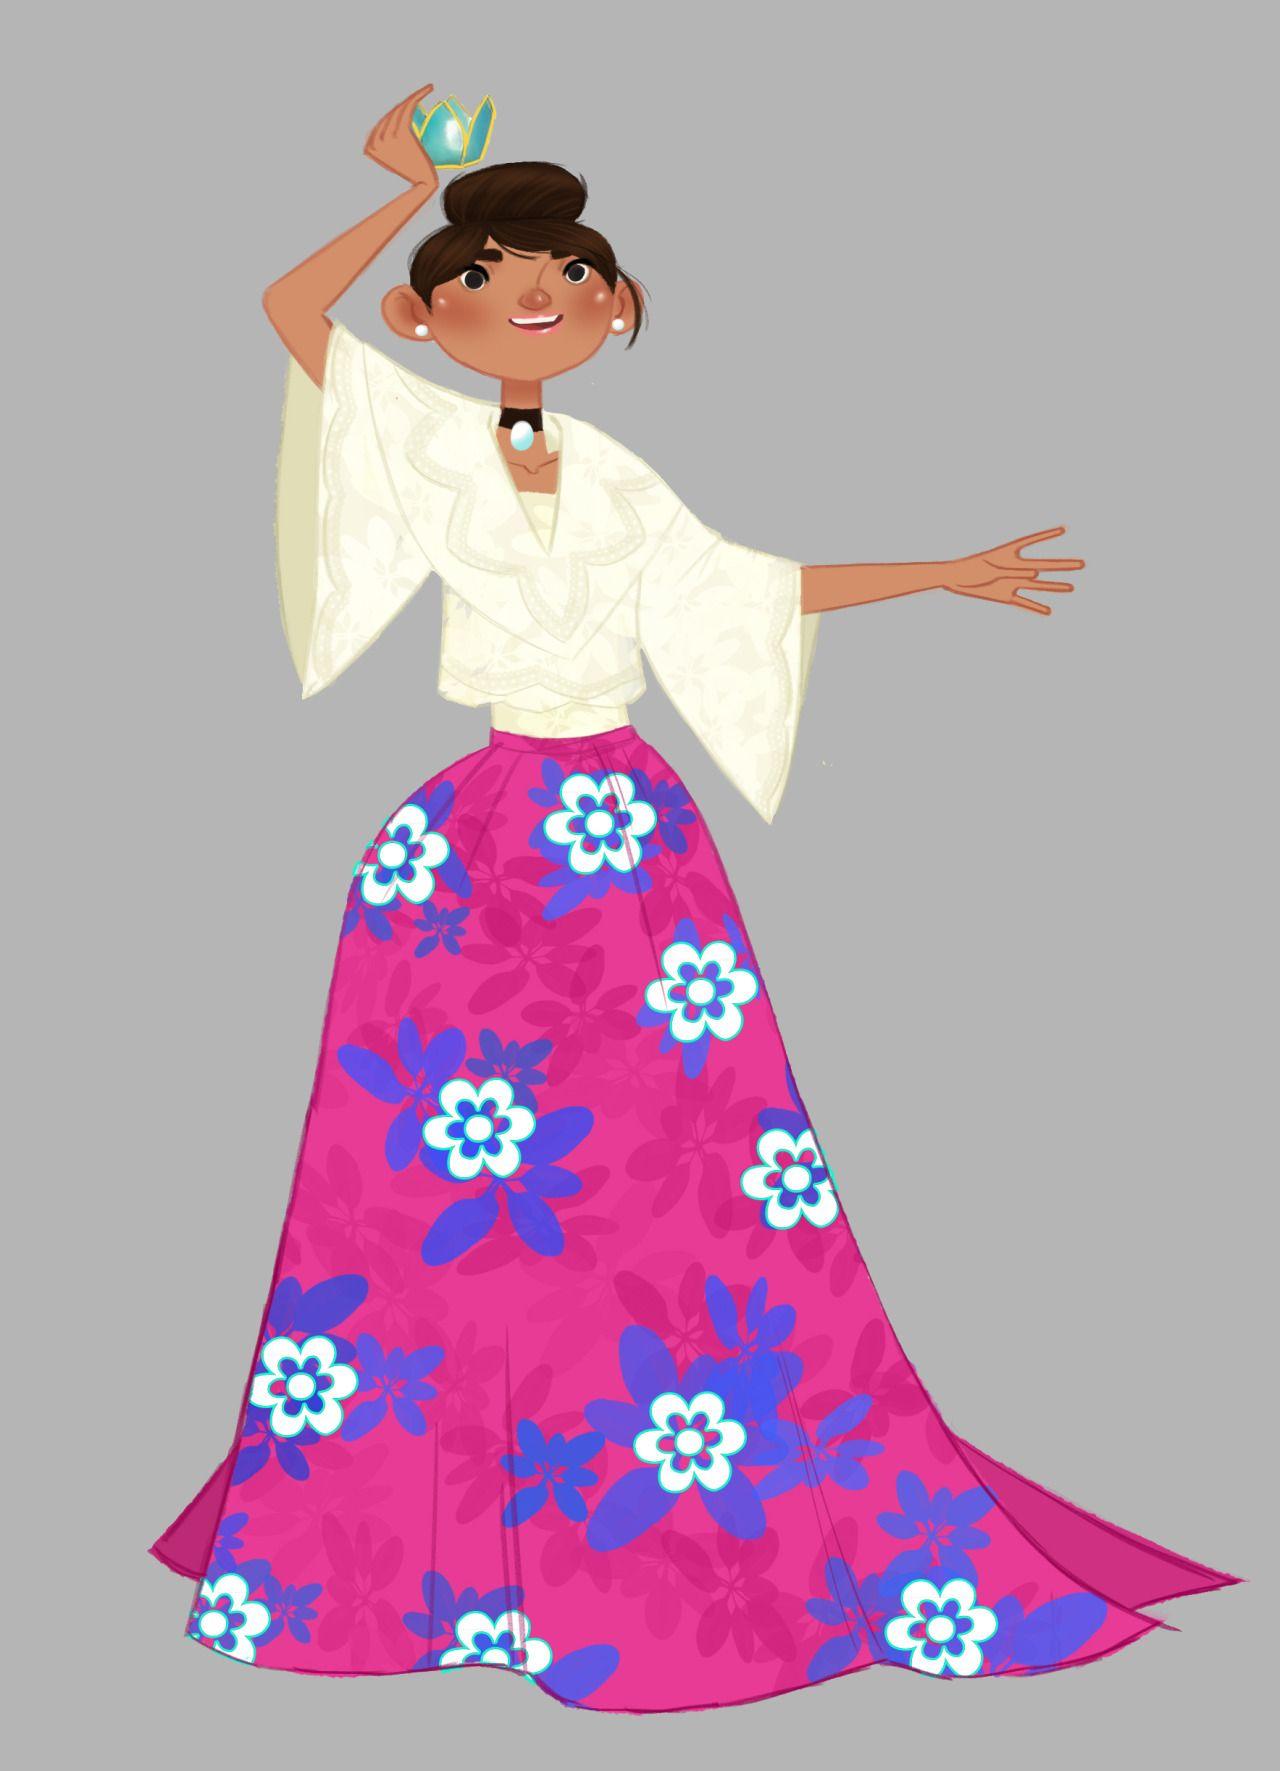 Filipino Kimona Dress. Spanish influence with Polynesian floral ...